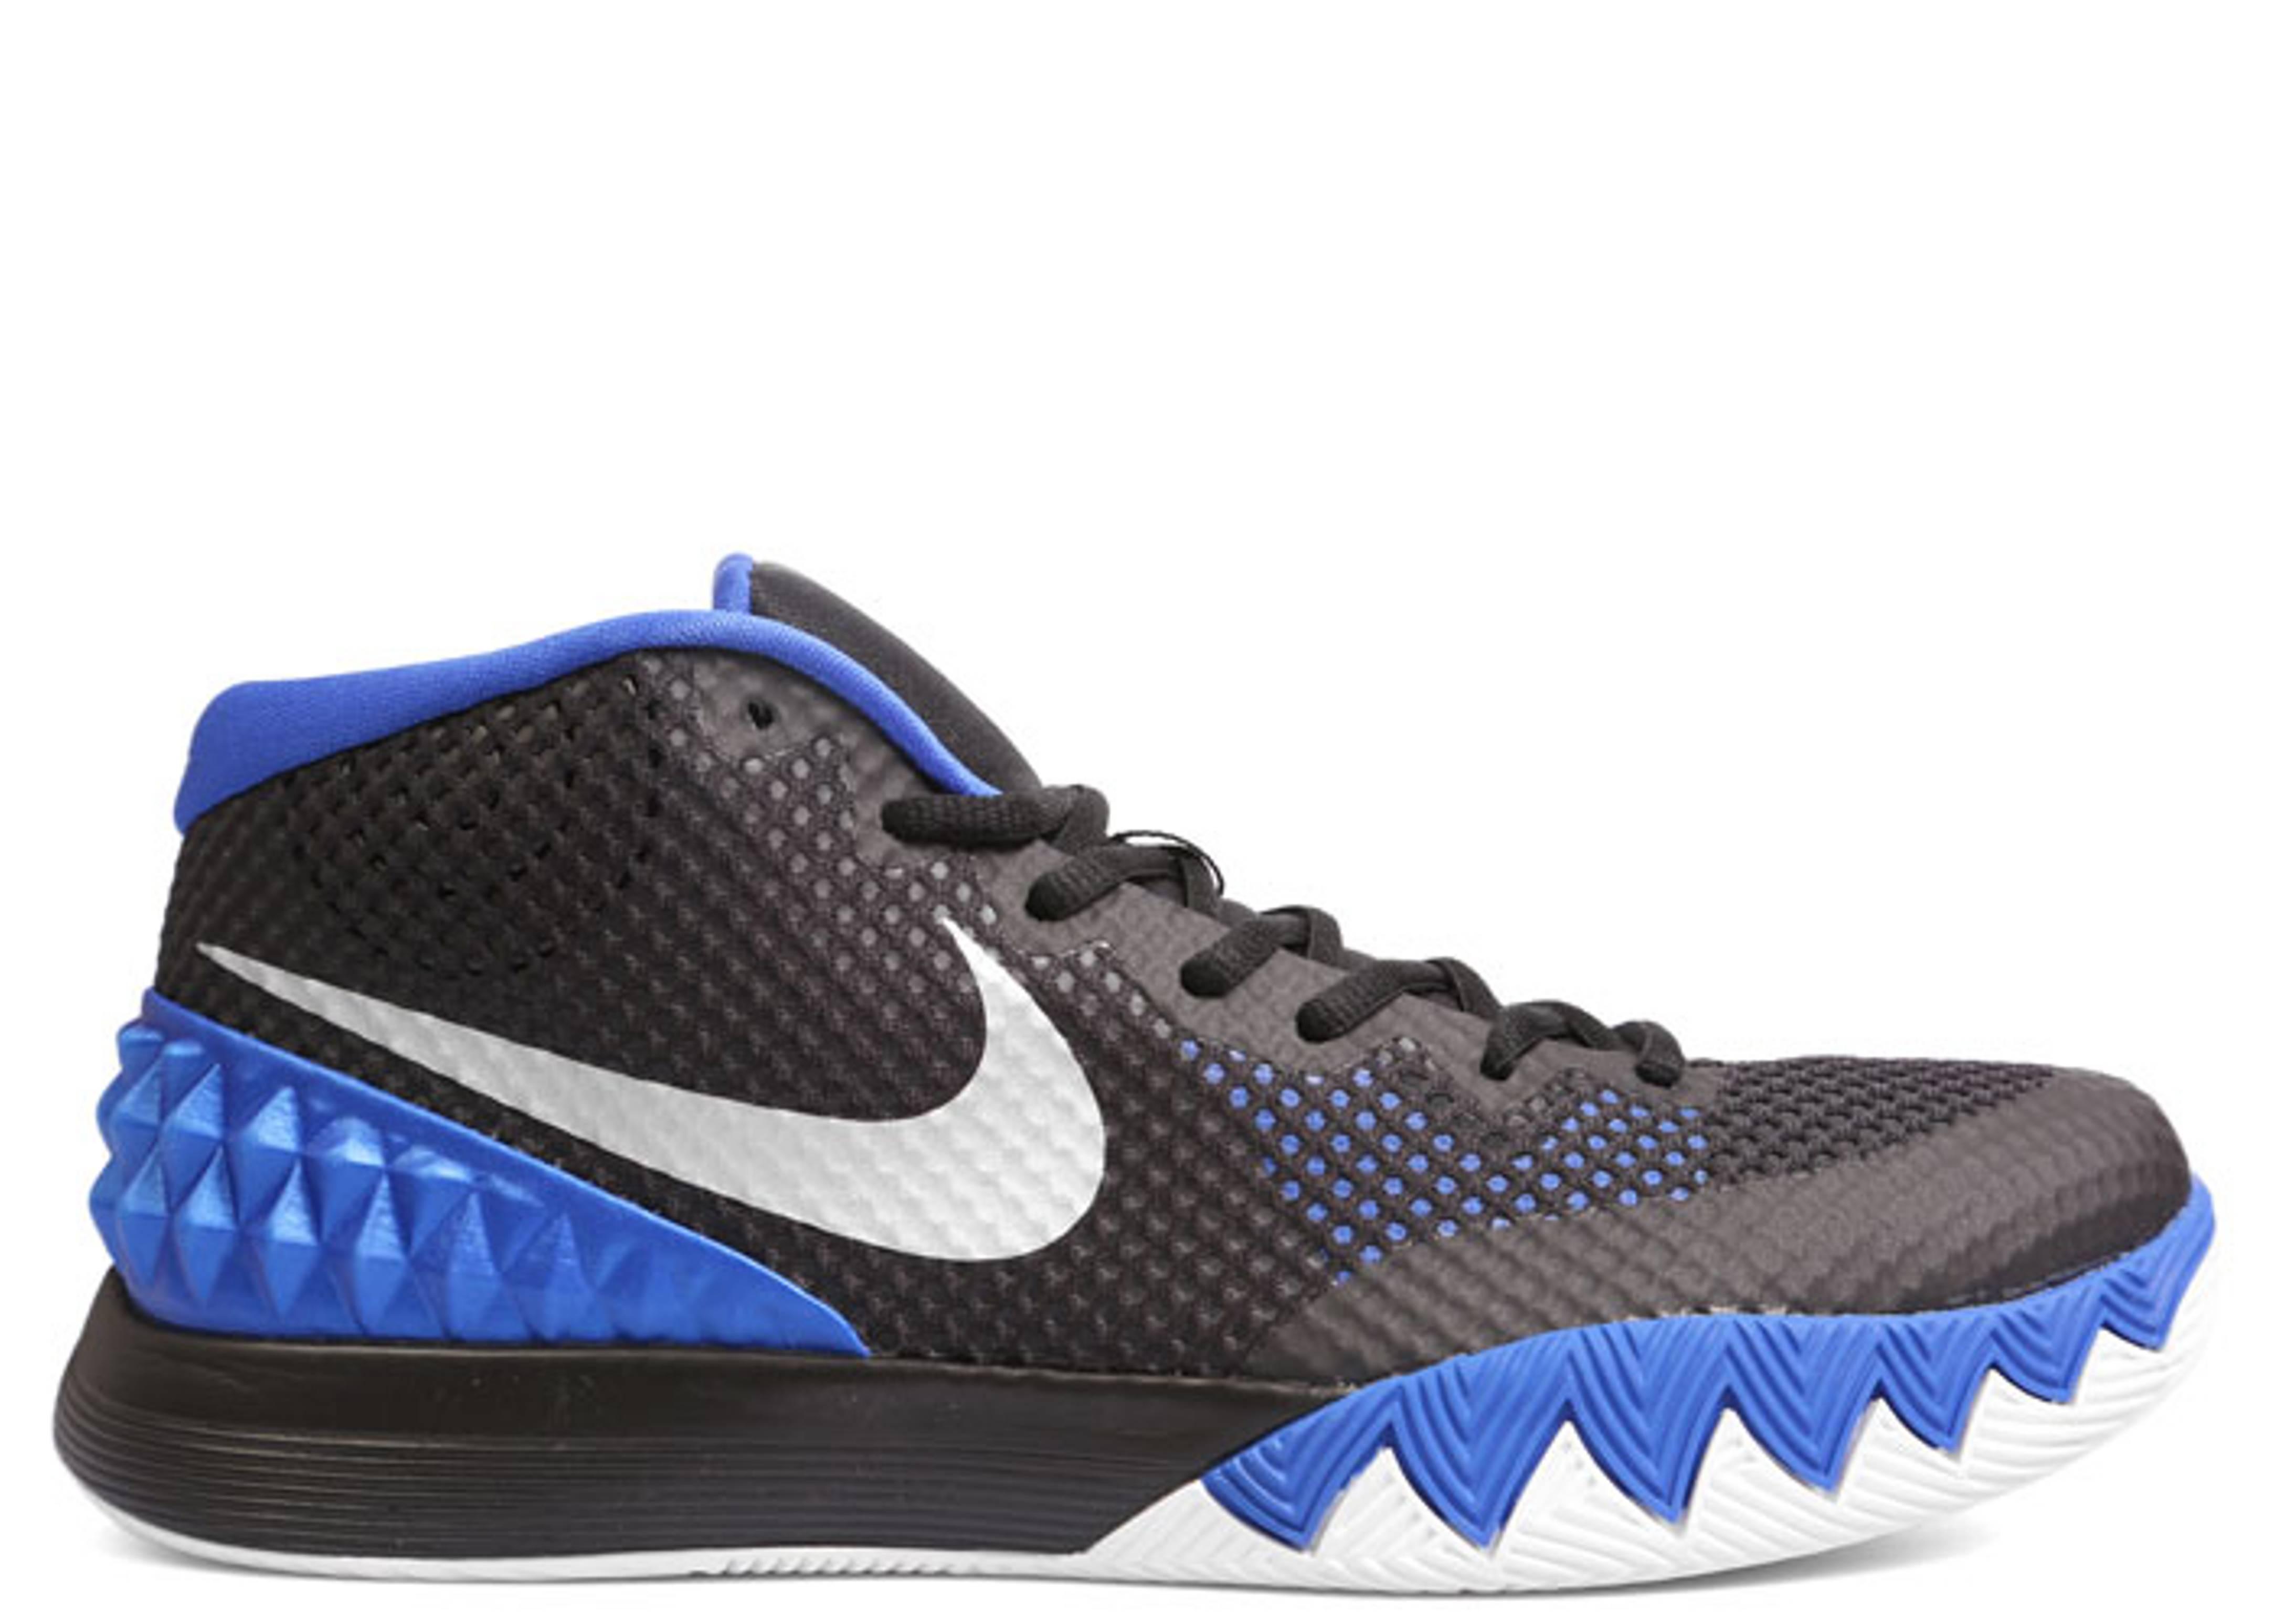 new concept 4585a 7a73f Kyrie Irving - Nike Basketball - Nike   Flight Club